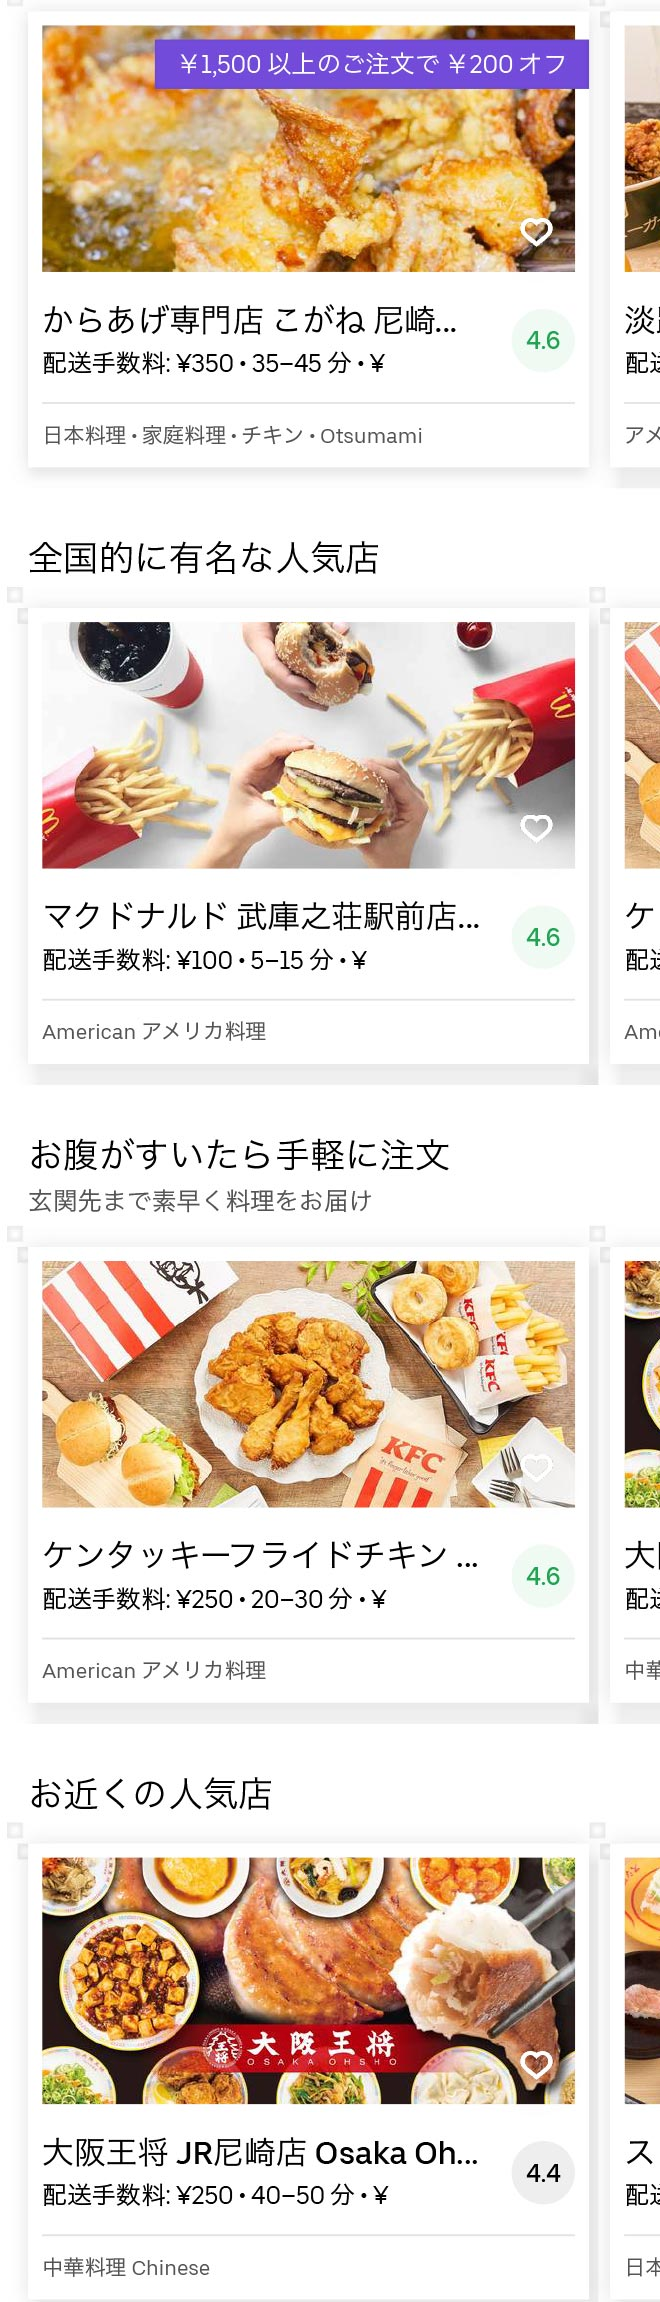 Amagasaki mukonosou menu 2005 01